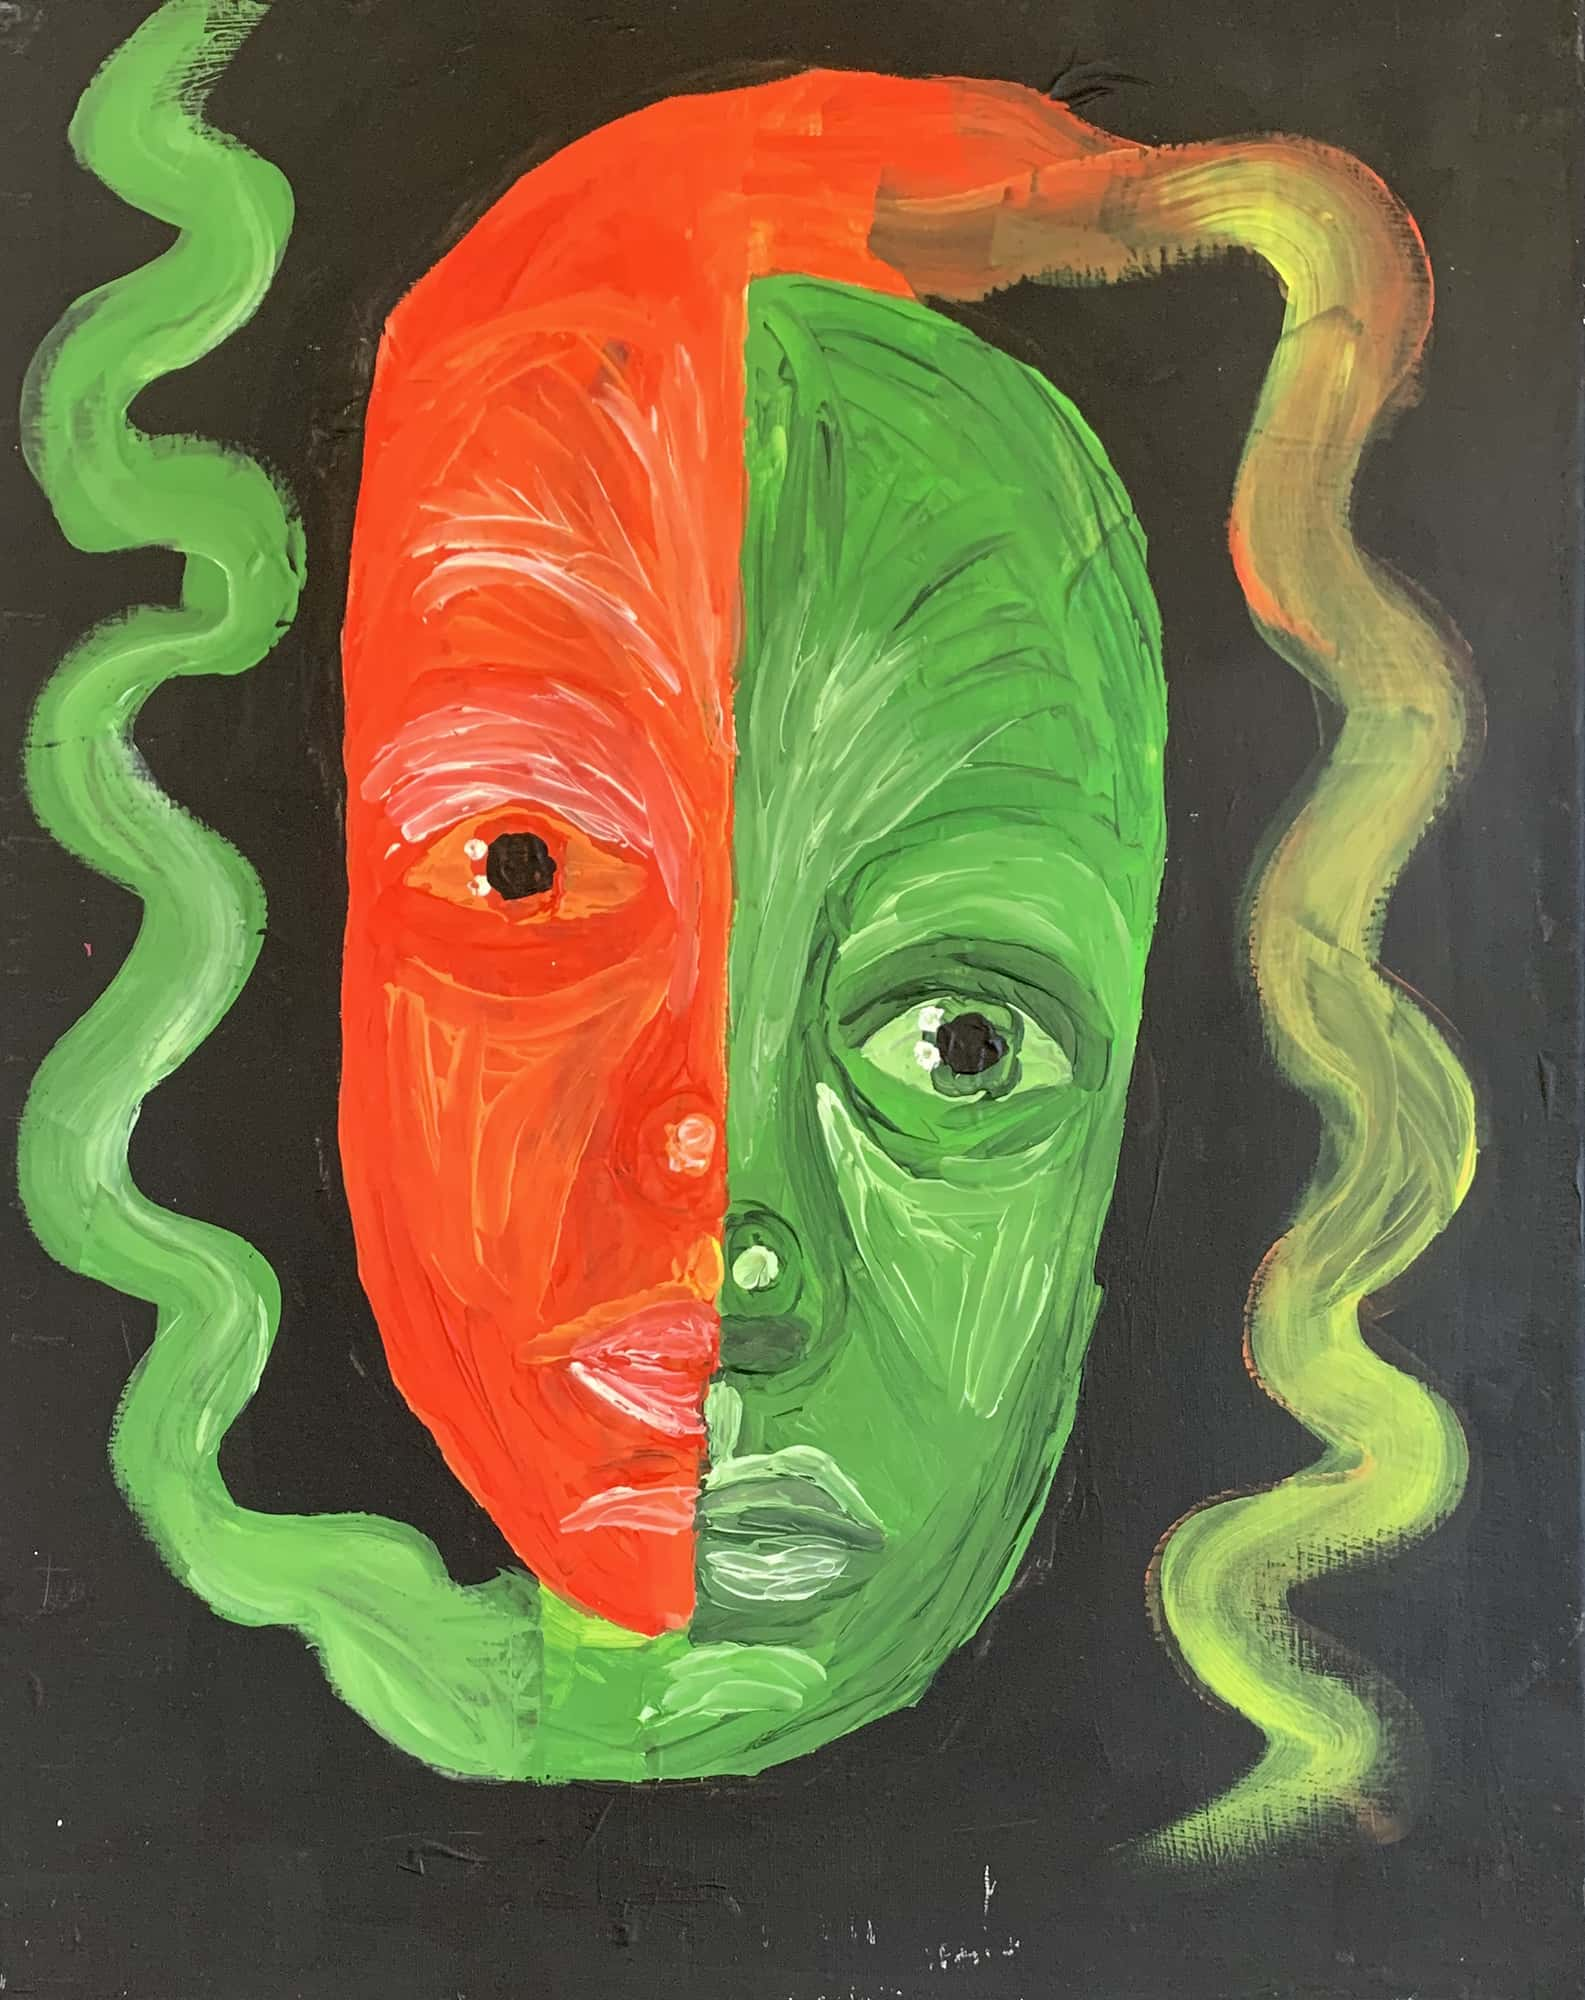 Cheyenne-Williams-MA-Fine-Art-University -of-Sunderland-Creatives